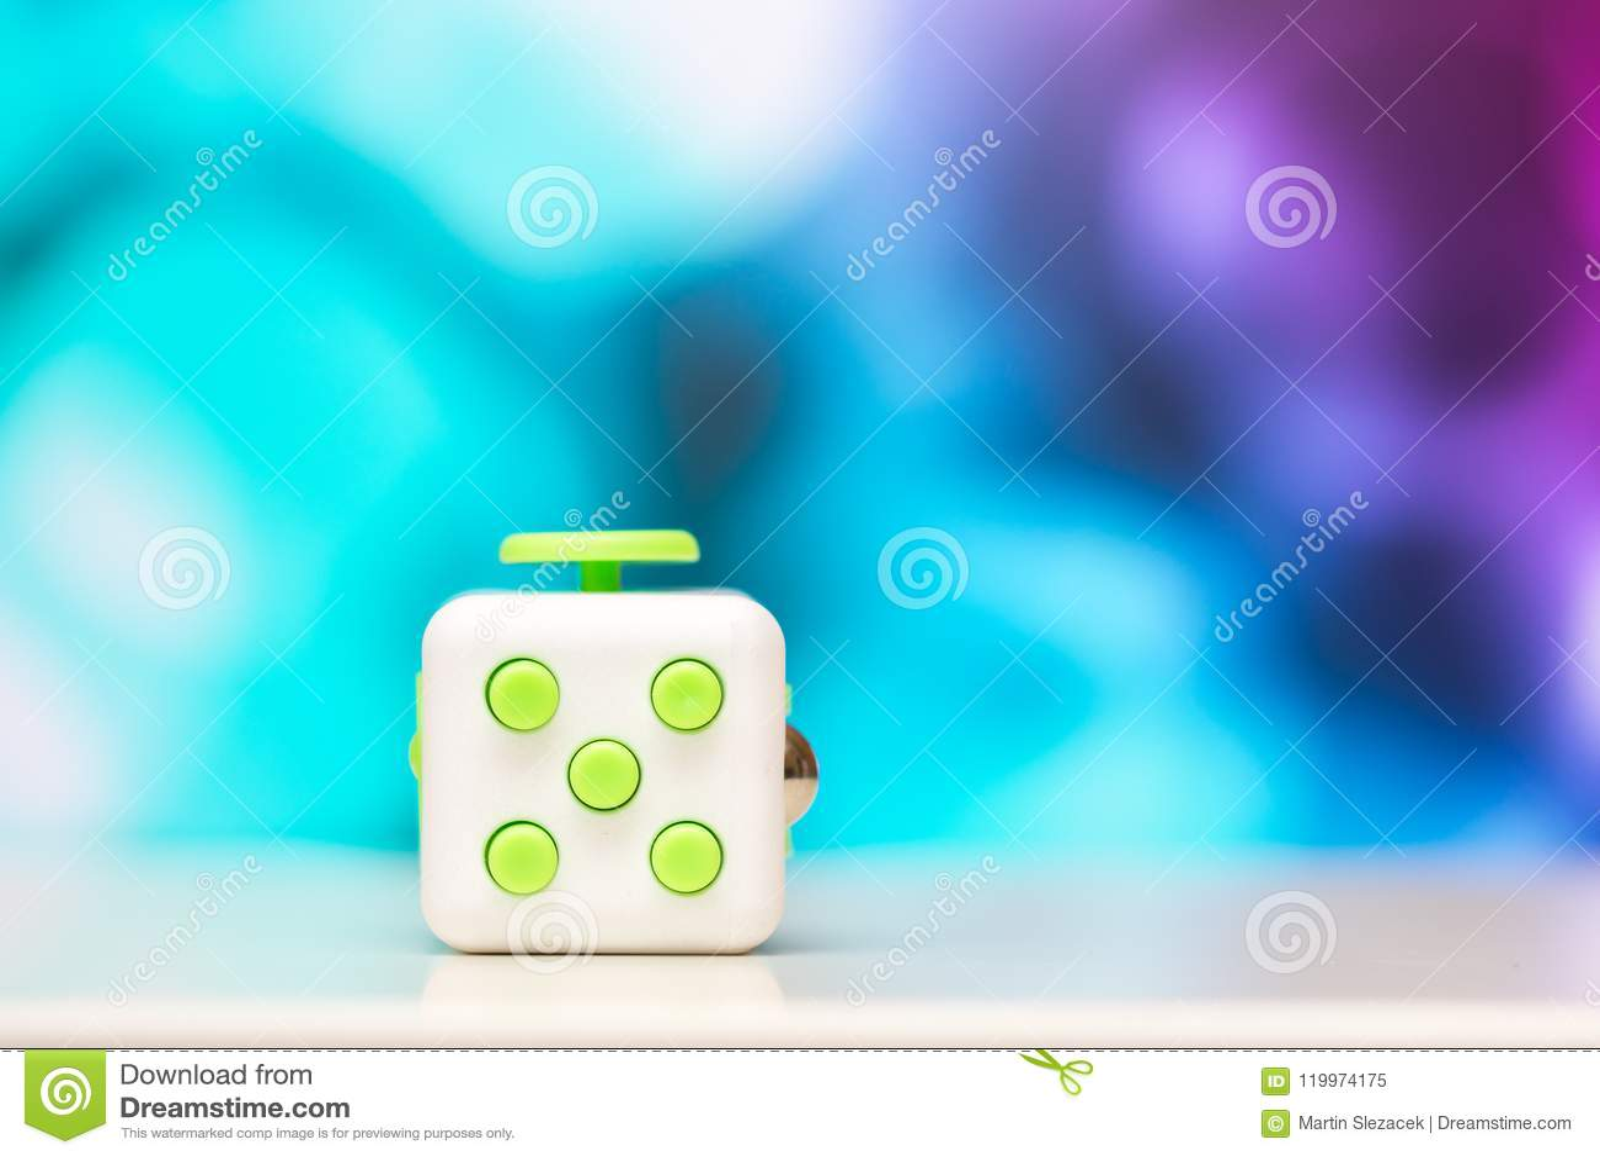 Friemel kubus antispanningsstuk speelgoed Het detail van het stuk speelgoed van het vingerspel wordt gebruikt die voor ontspant G